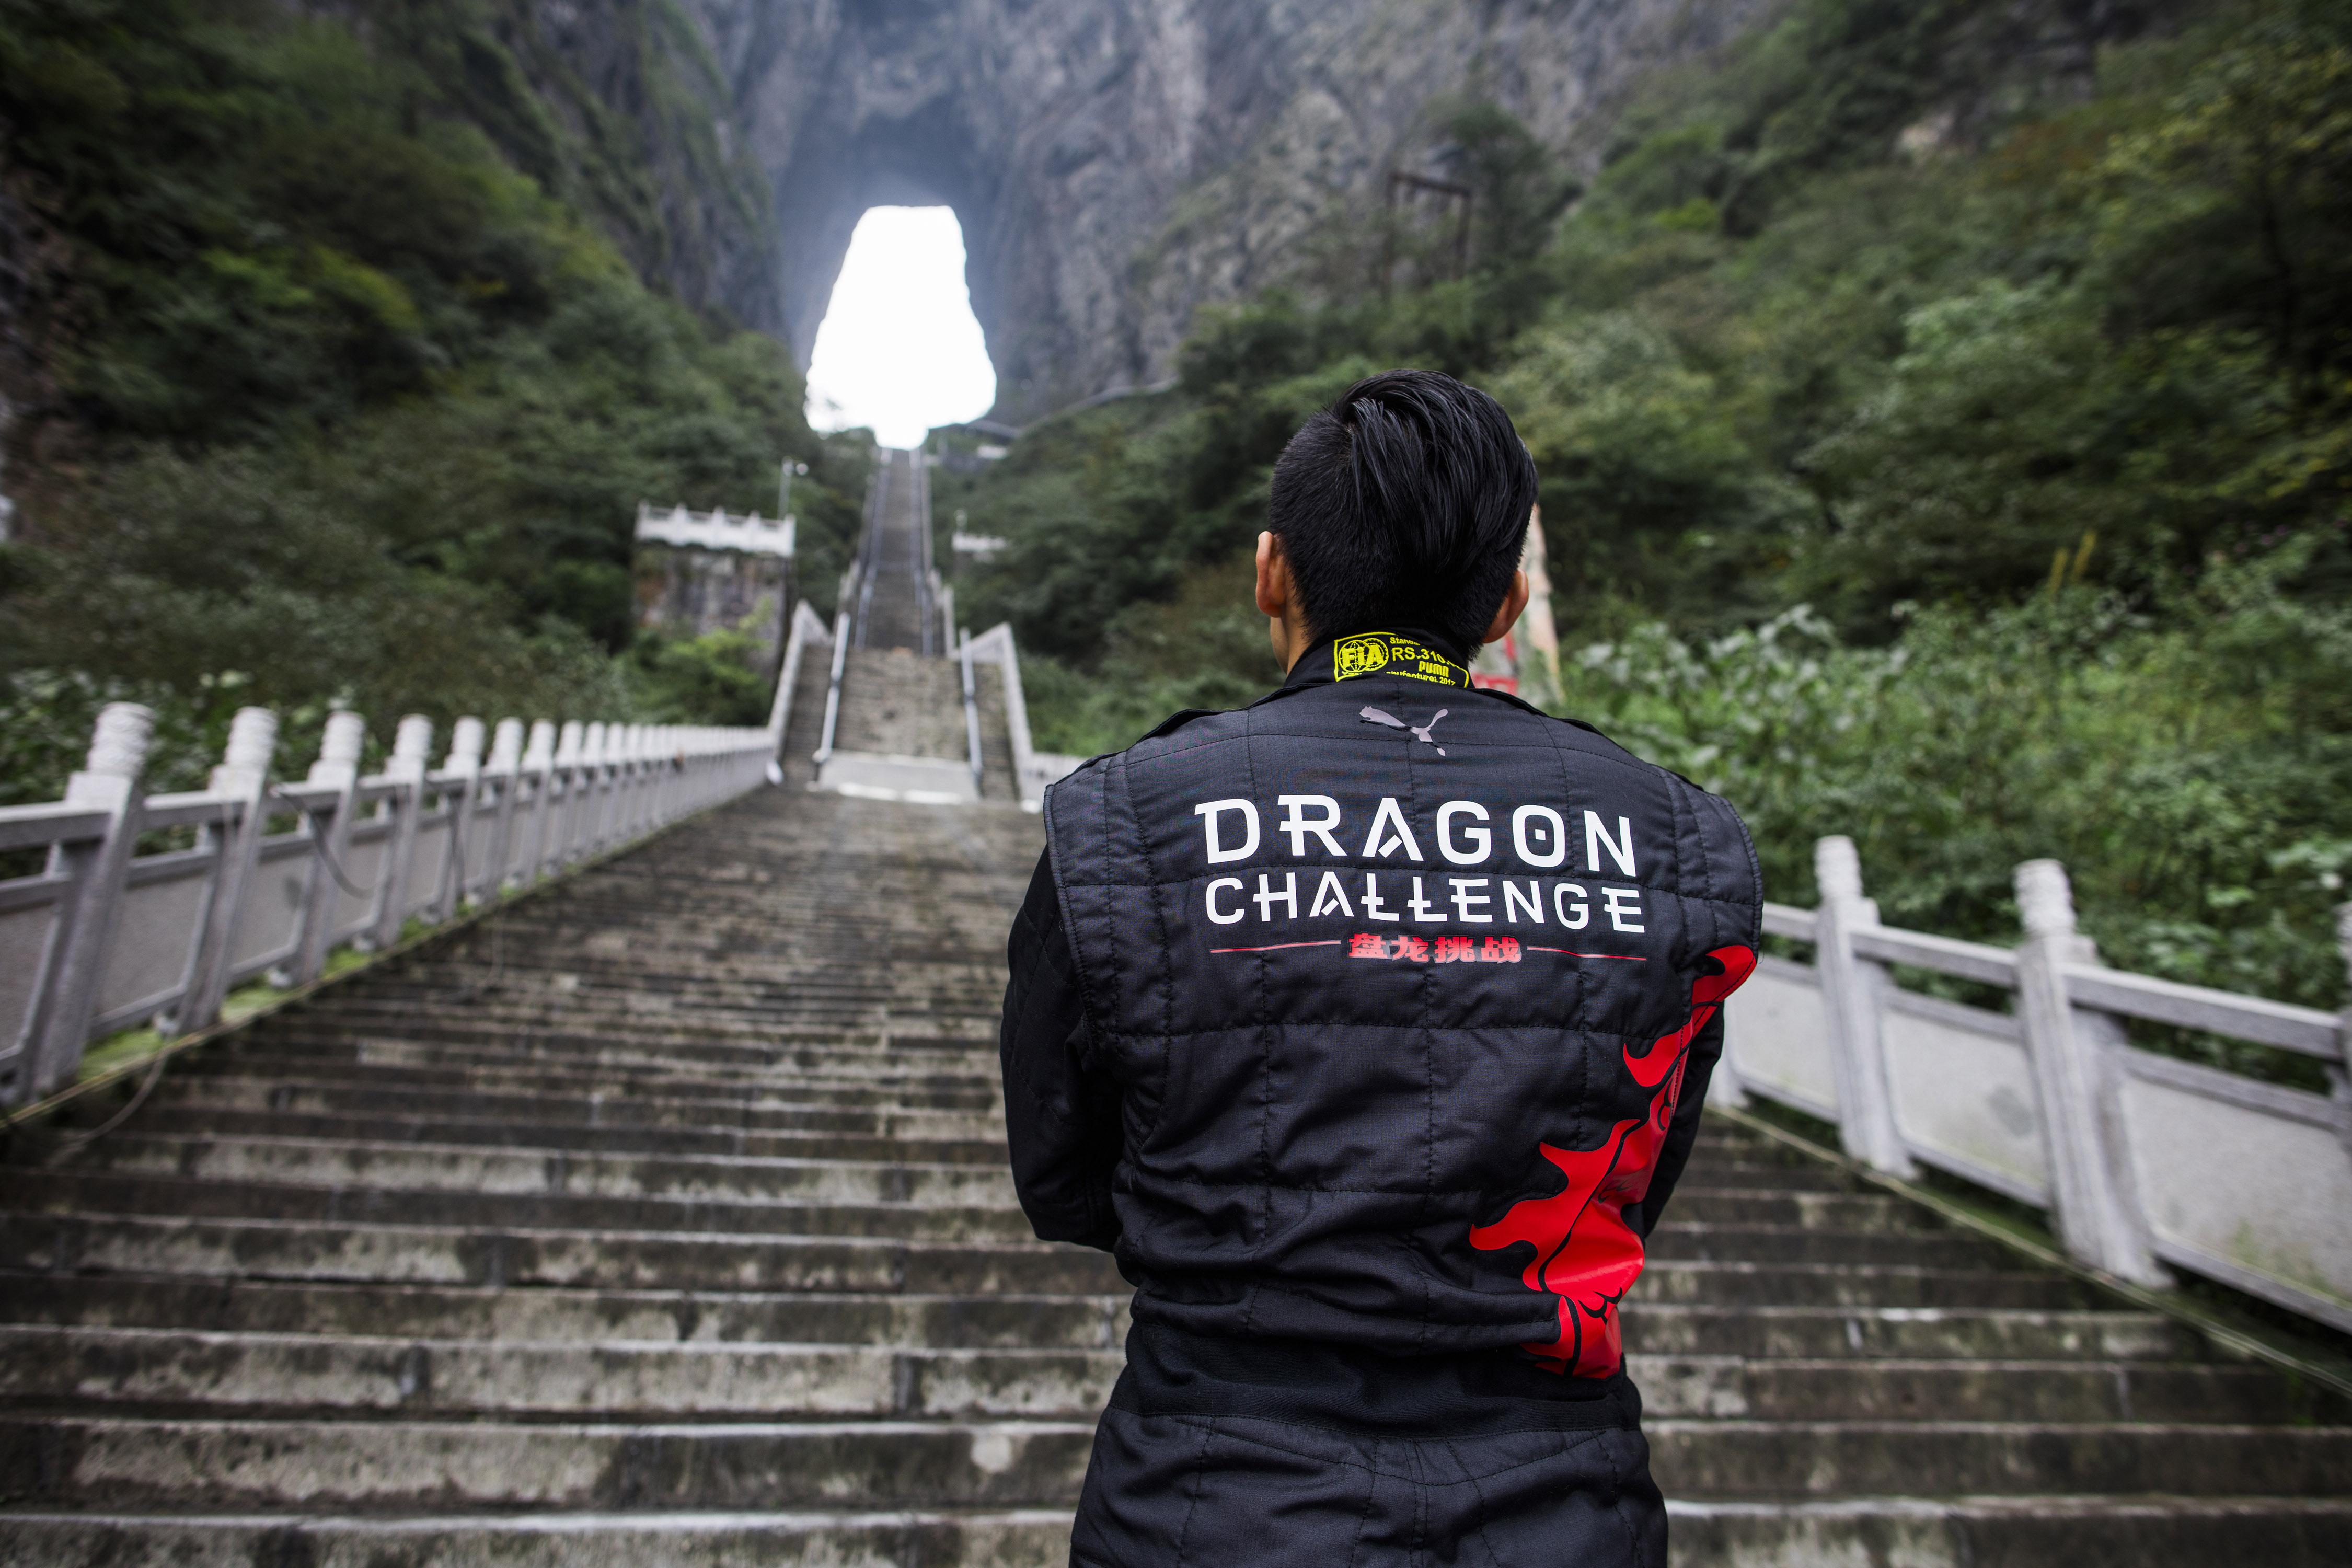 271963 06 range rover dragon challenge e6de96 original 1518171036